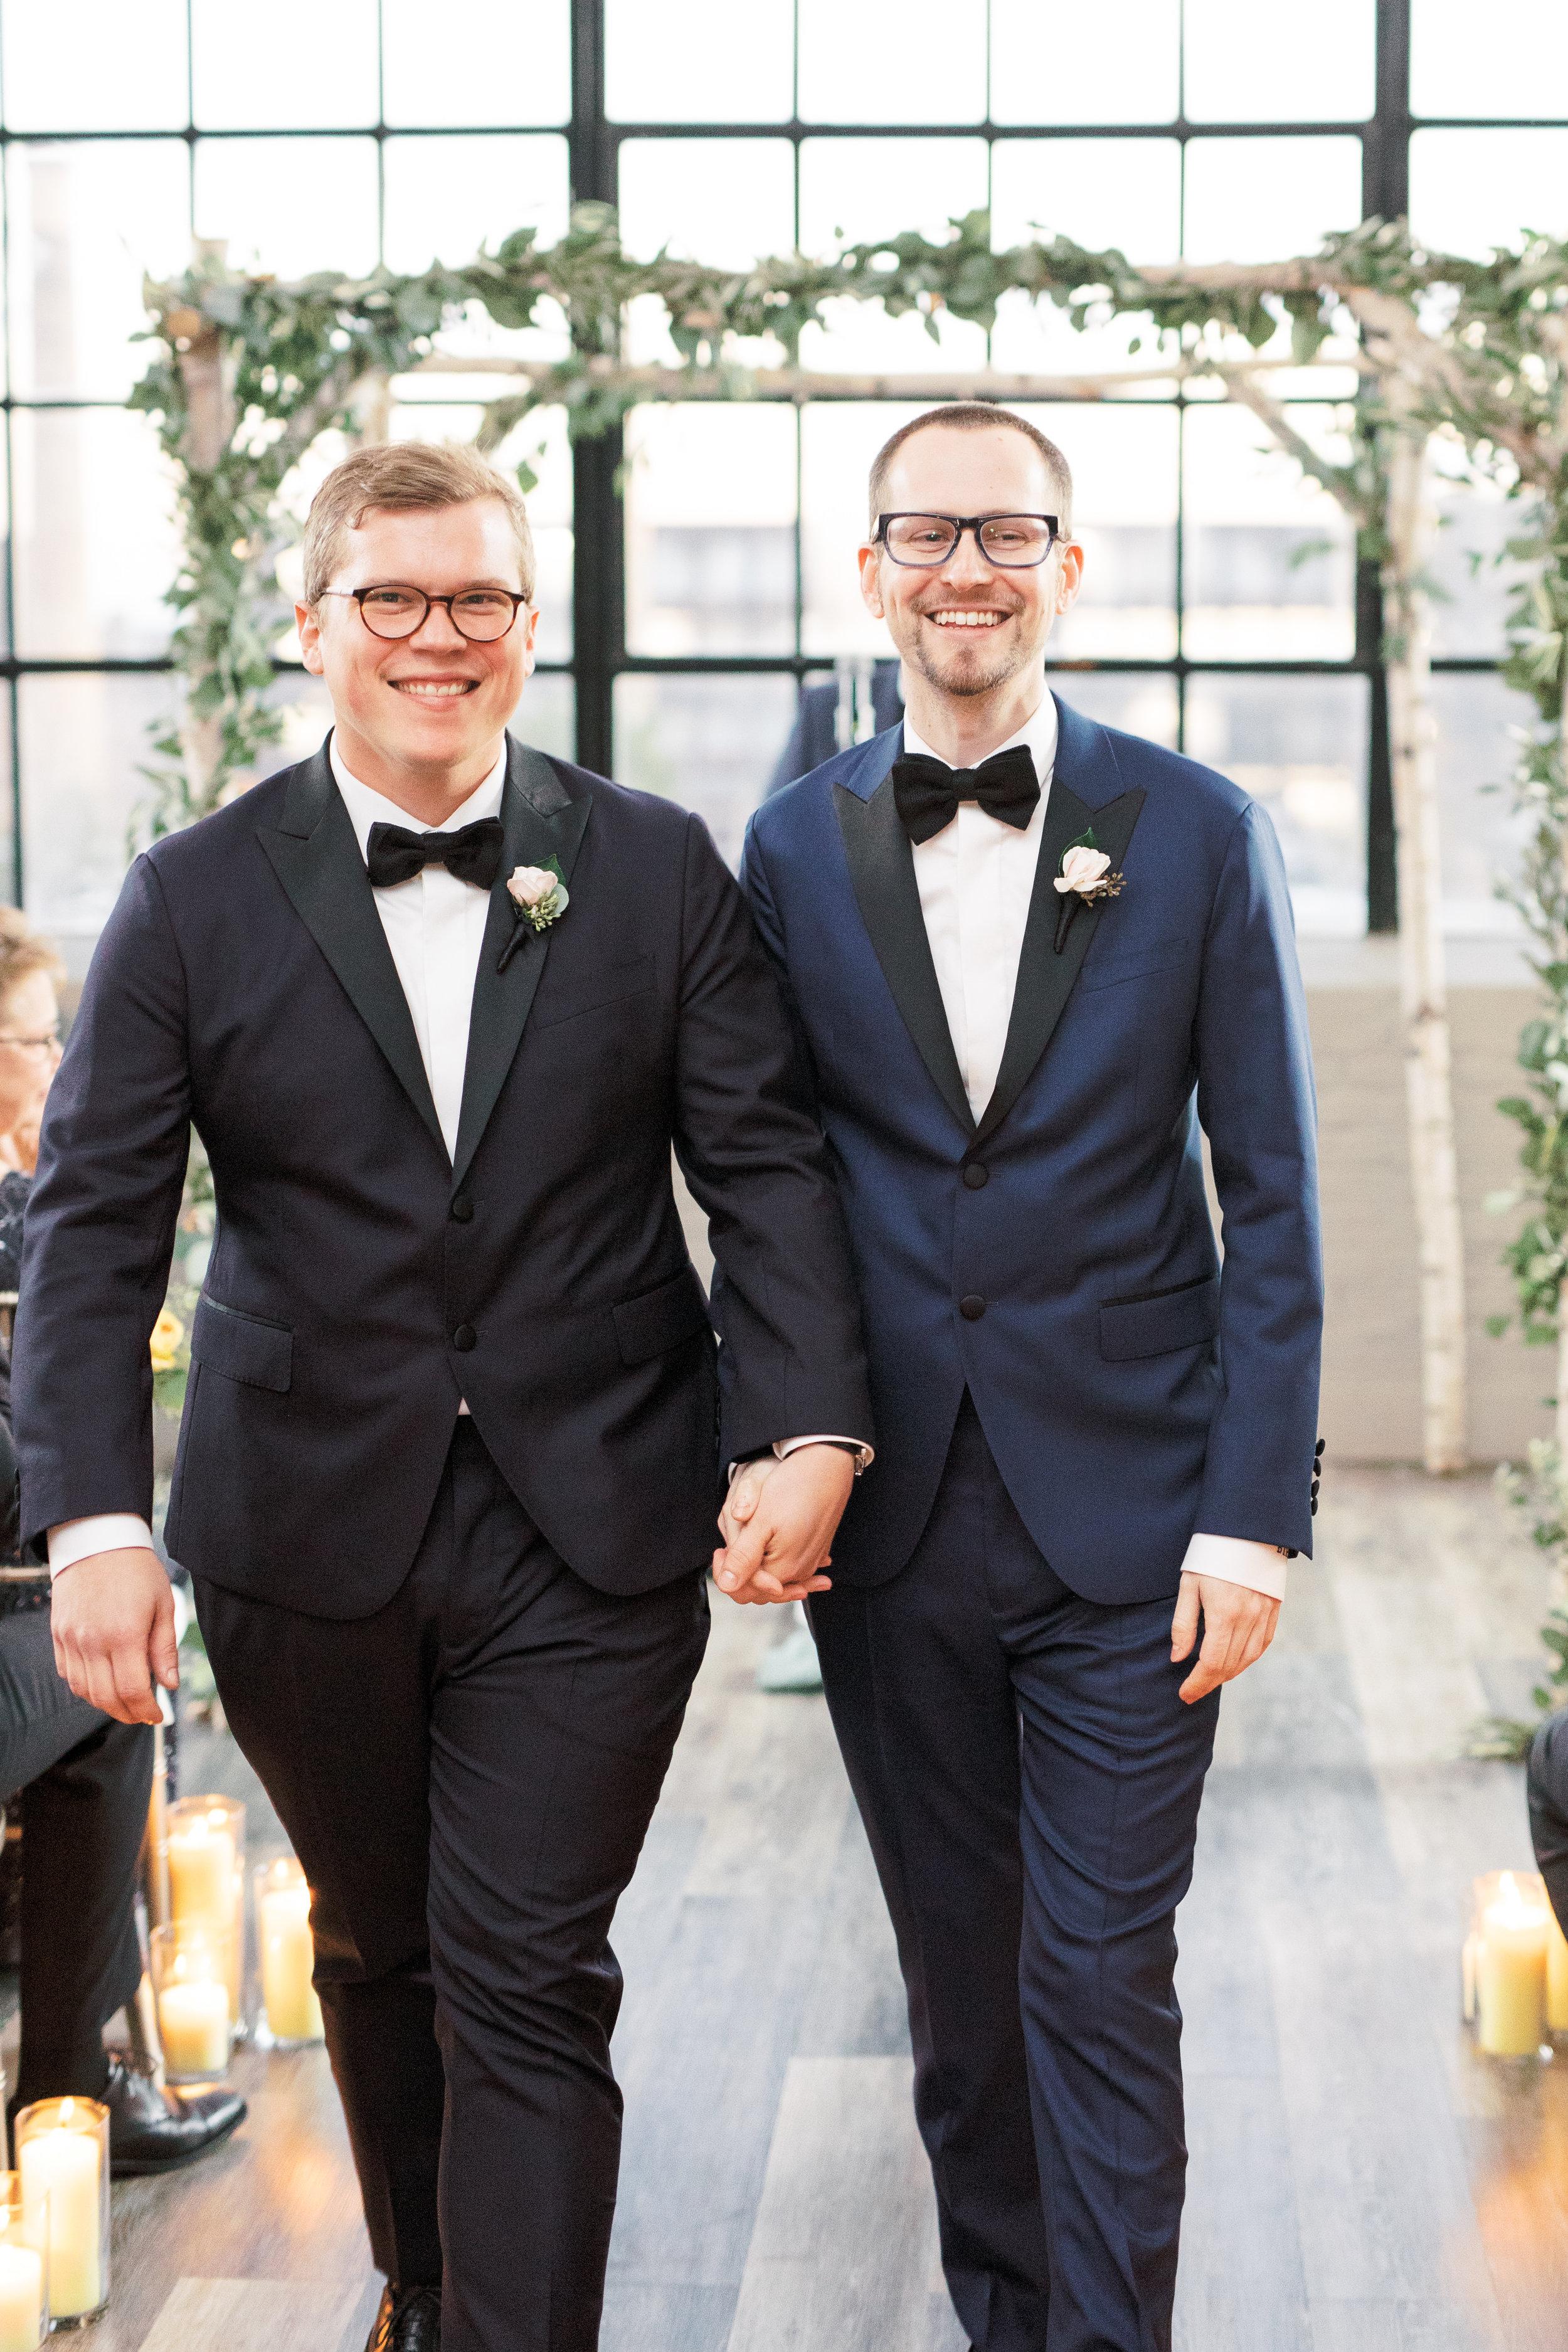 same sex wedding ceremony at FAME, industrial and modern warehouse Philadelphia wedding venue, precessing as husbands